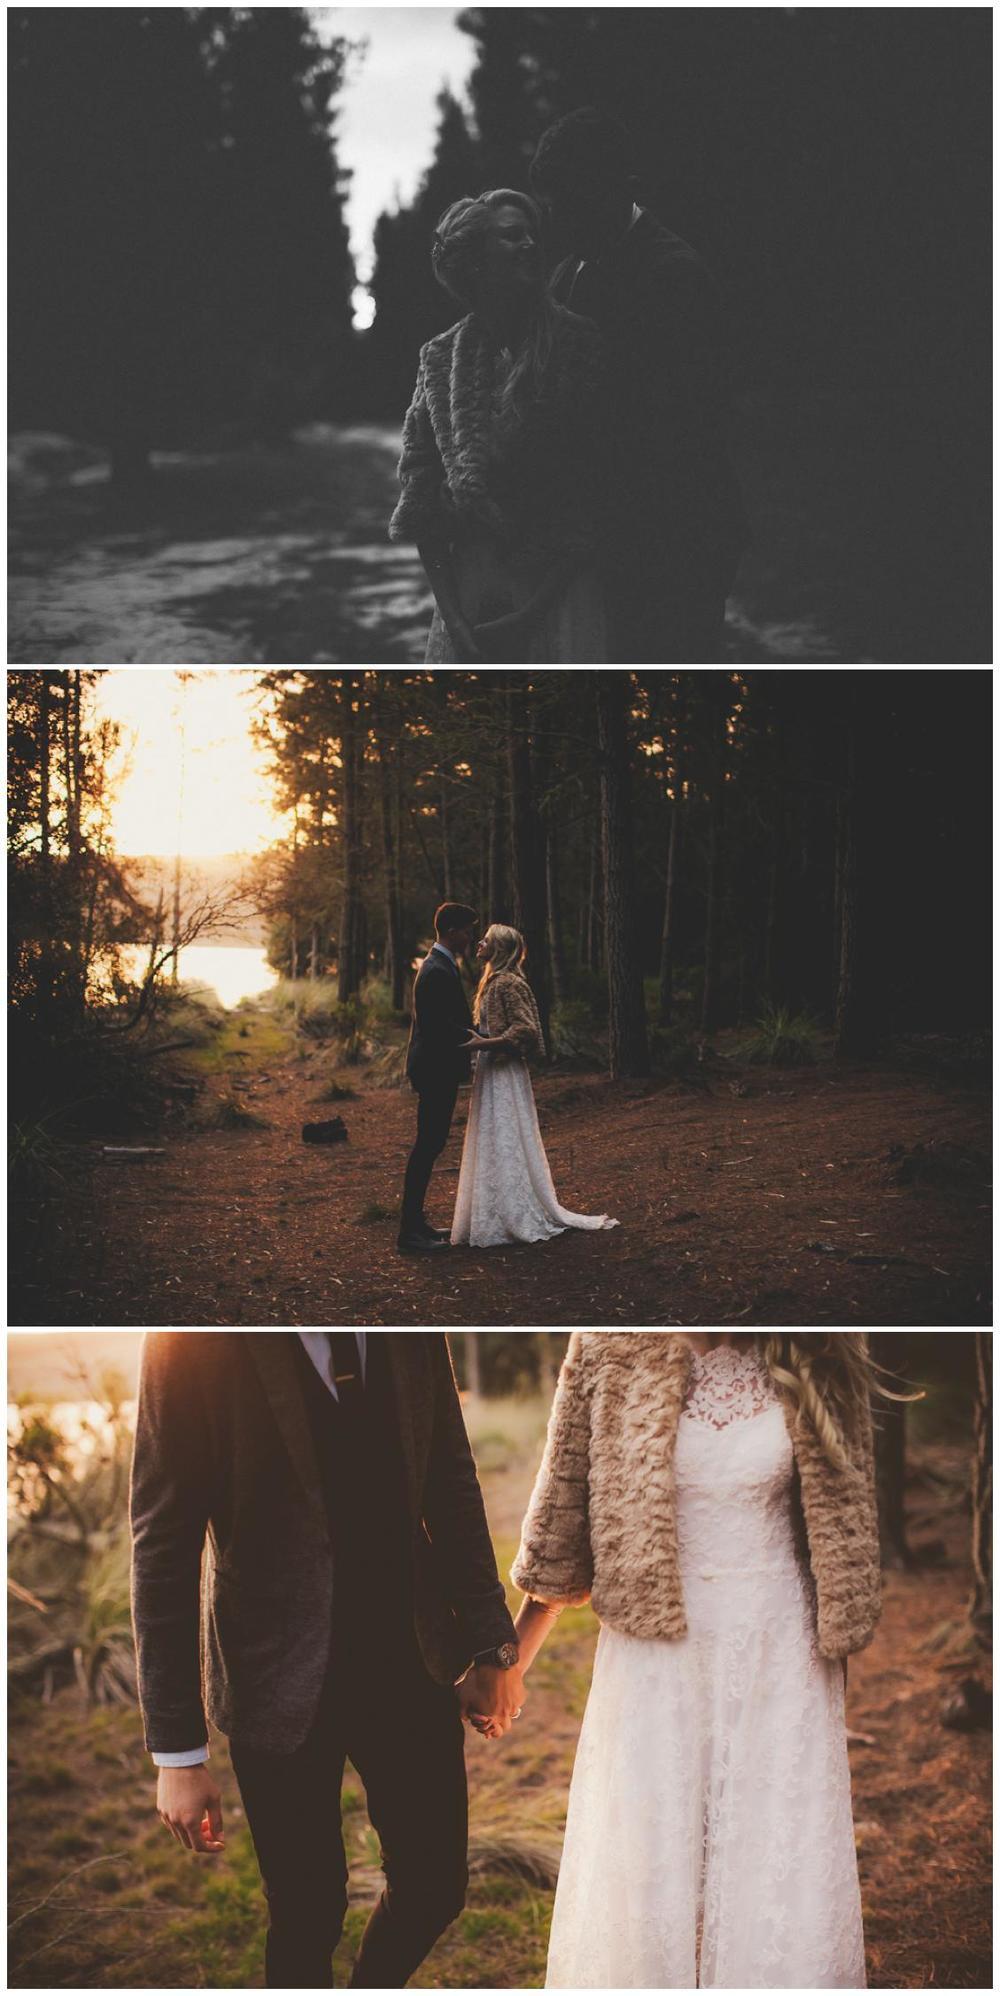 Wessel&Clarissa_FionaClairPhotography-128.jpg